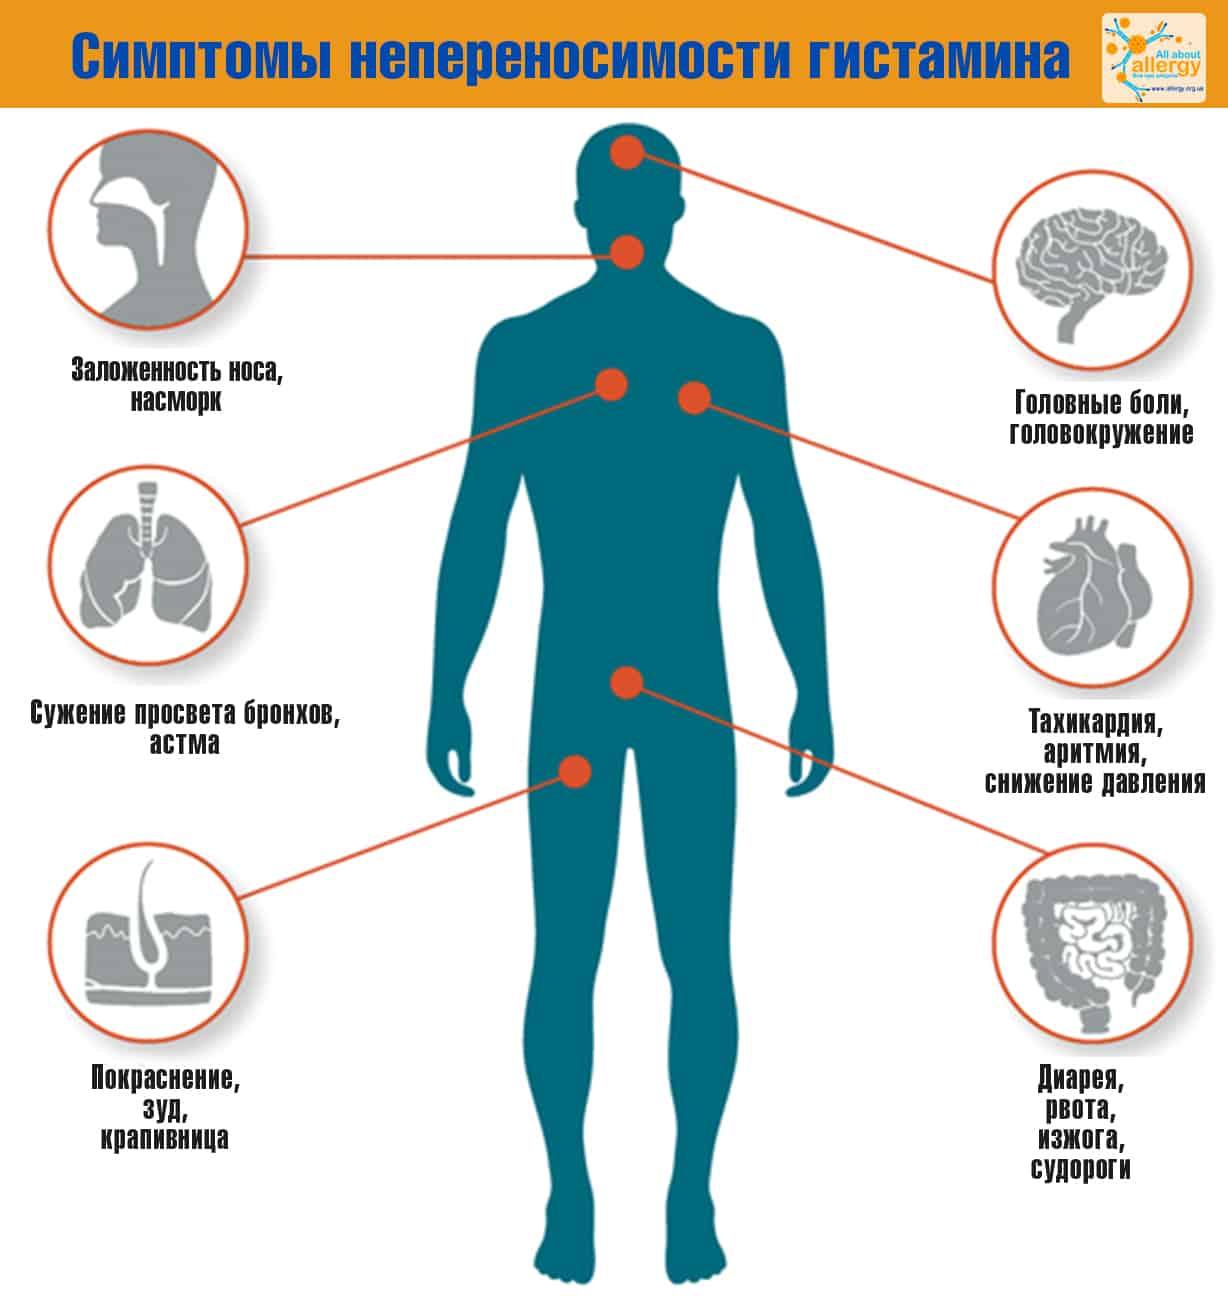 Histaminintoleranz_rus